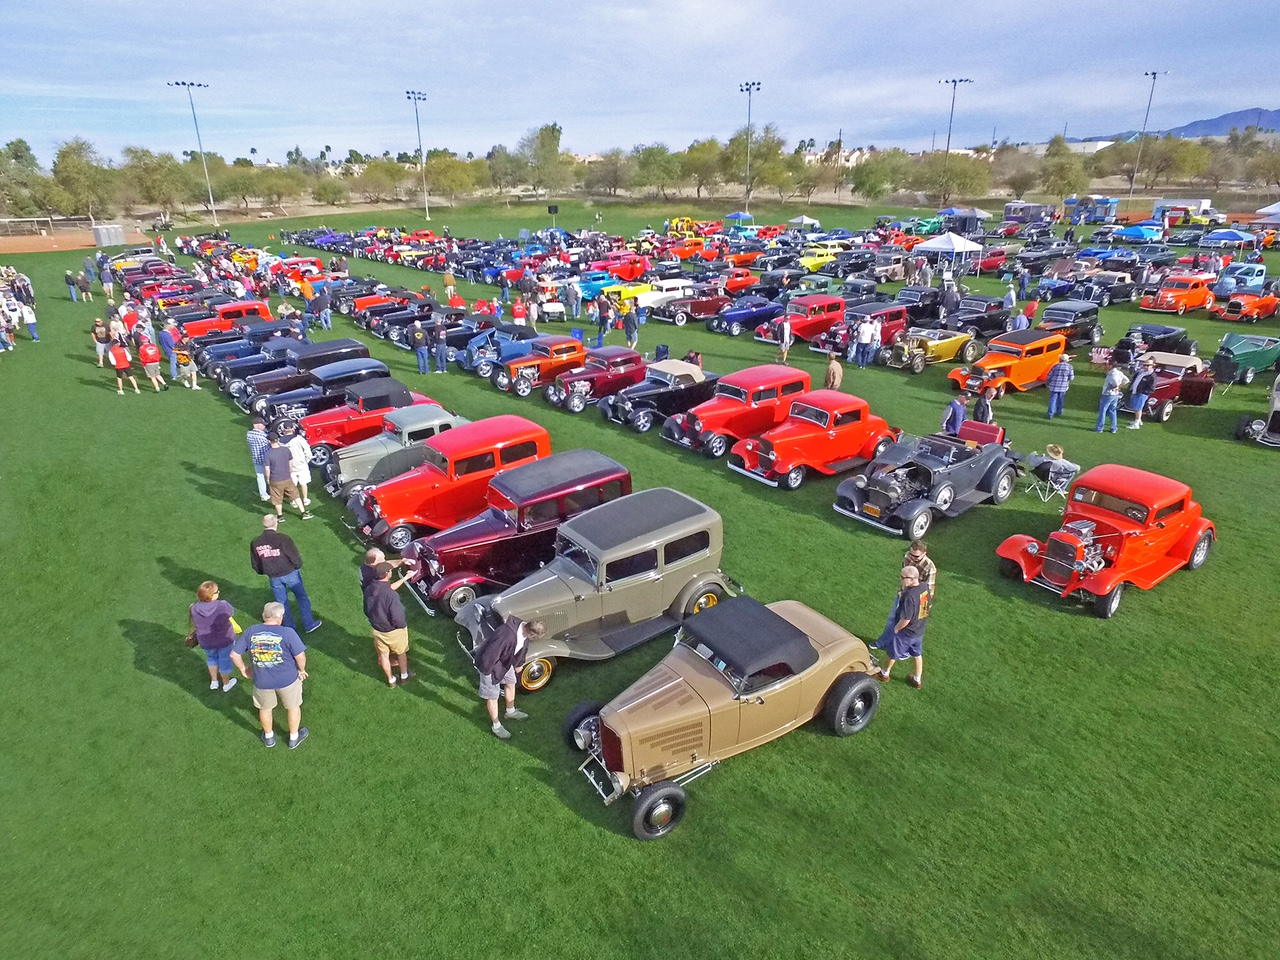 Hot Rod Hotline Car Shows >> Havasu Deuces Car Show Hotrod Hotline